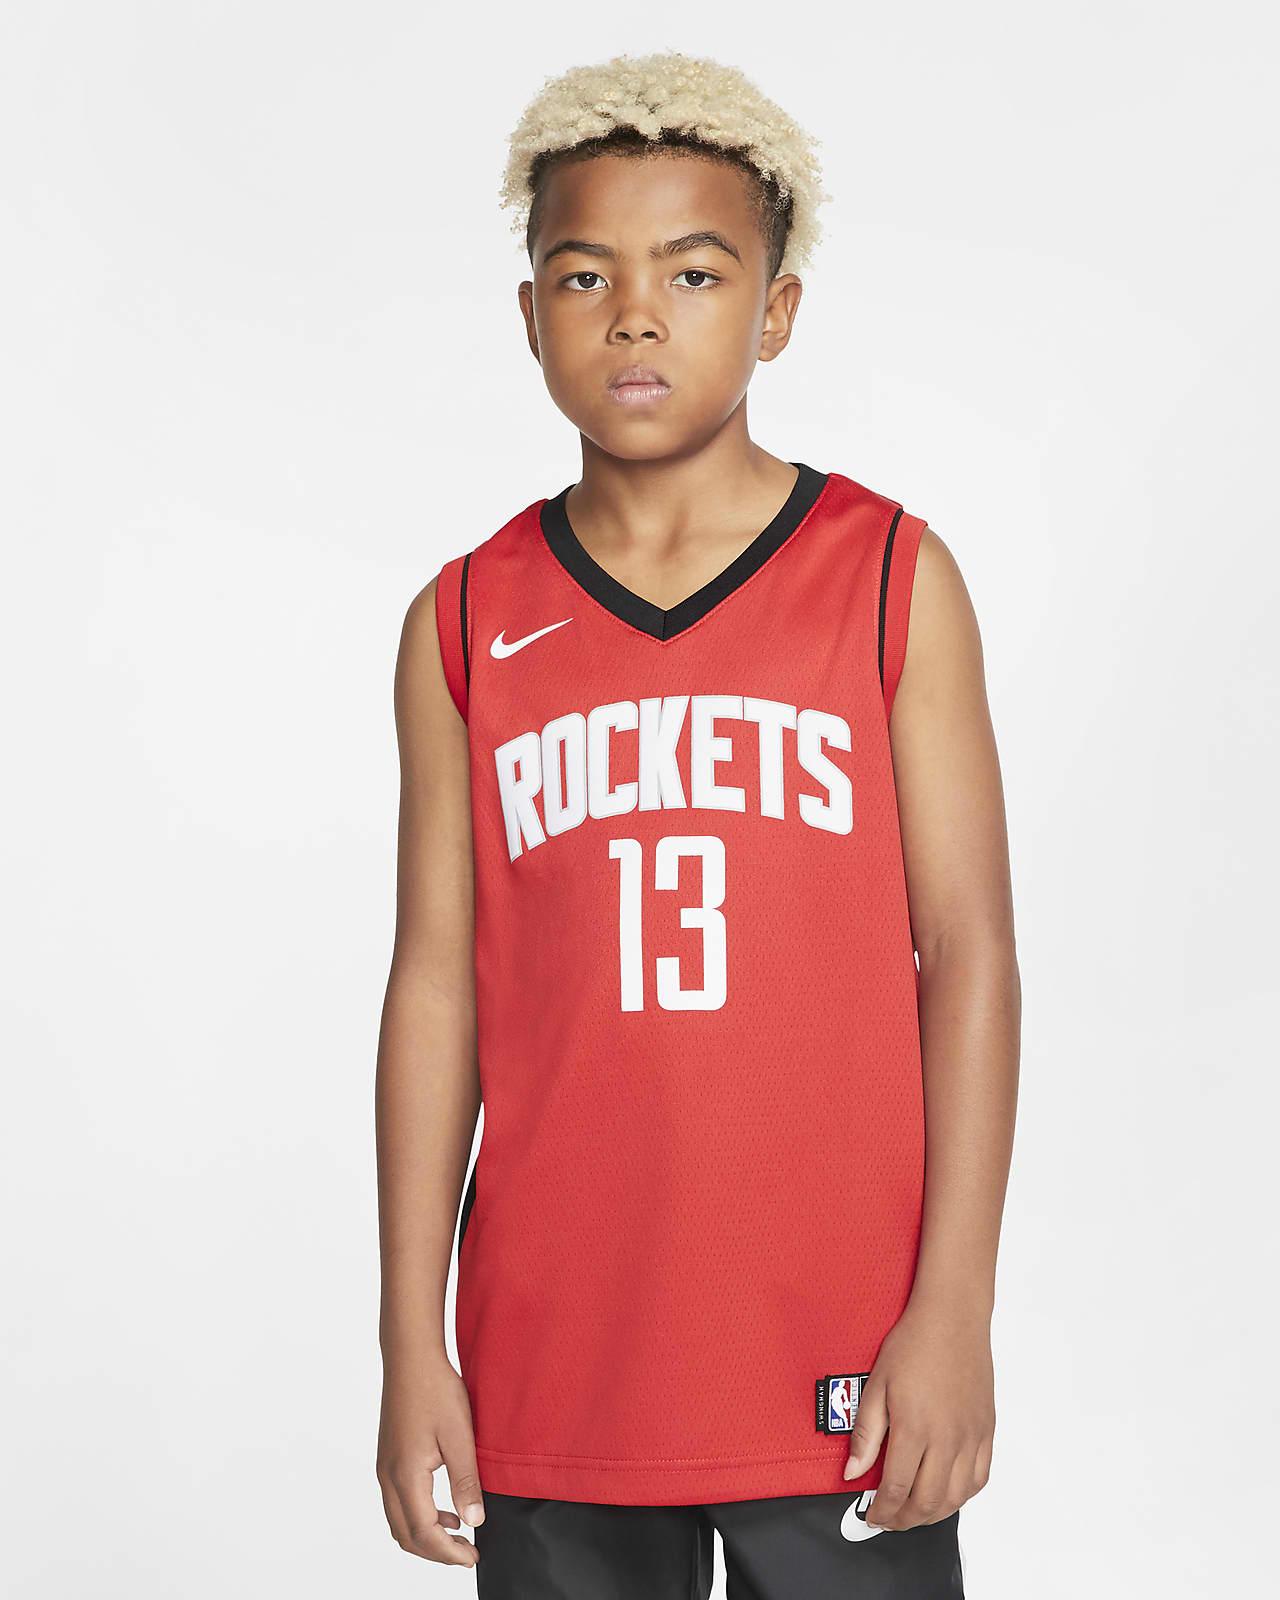 Camisola NBA da Nike Swingman Rockets Icon Edition Júnior